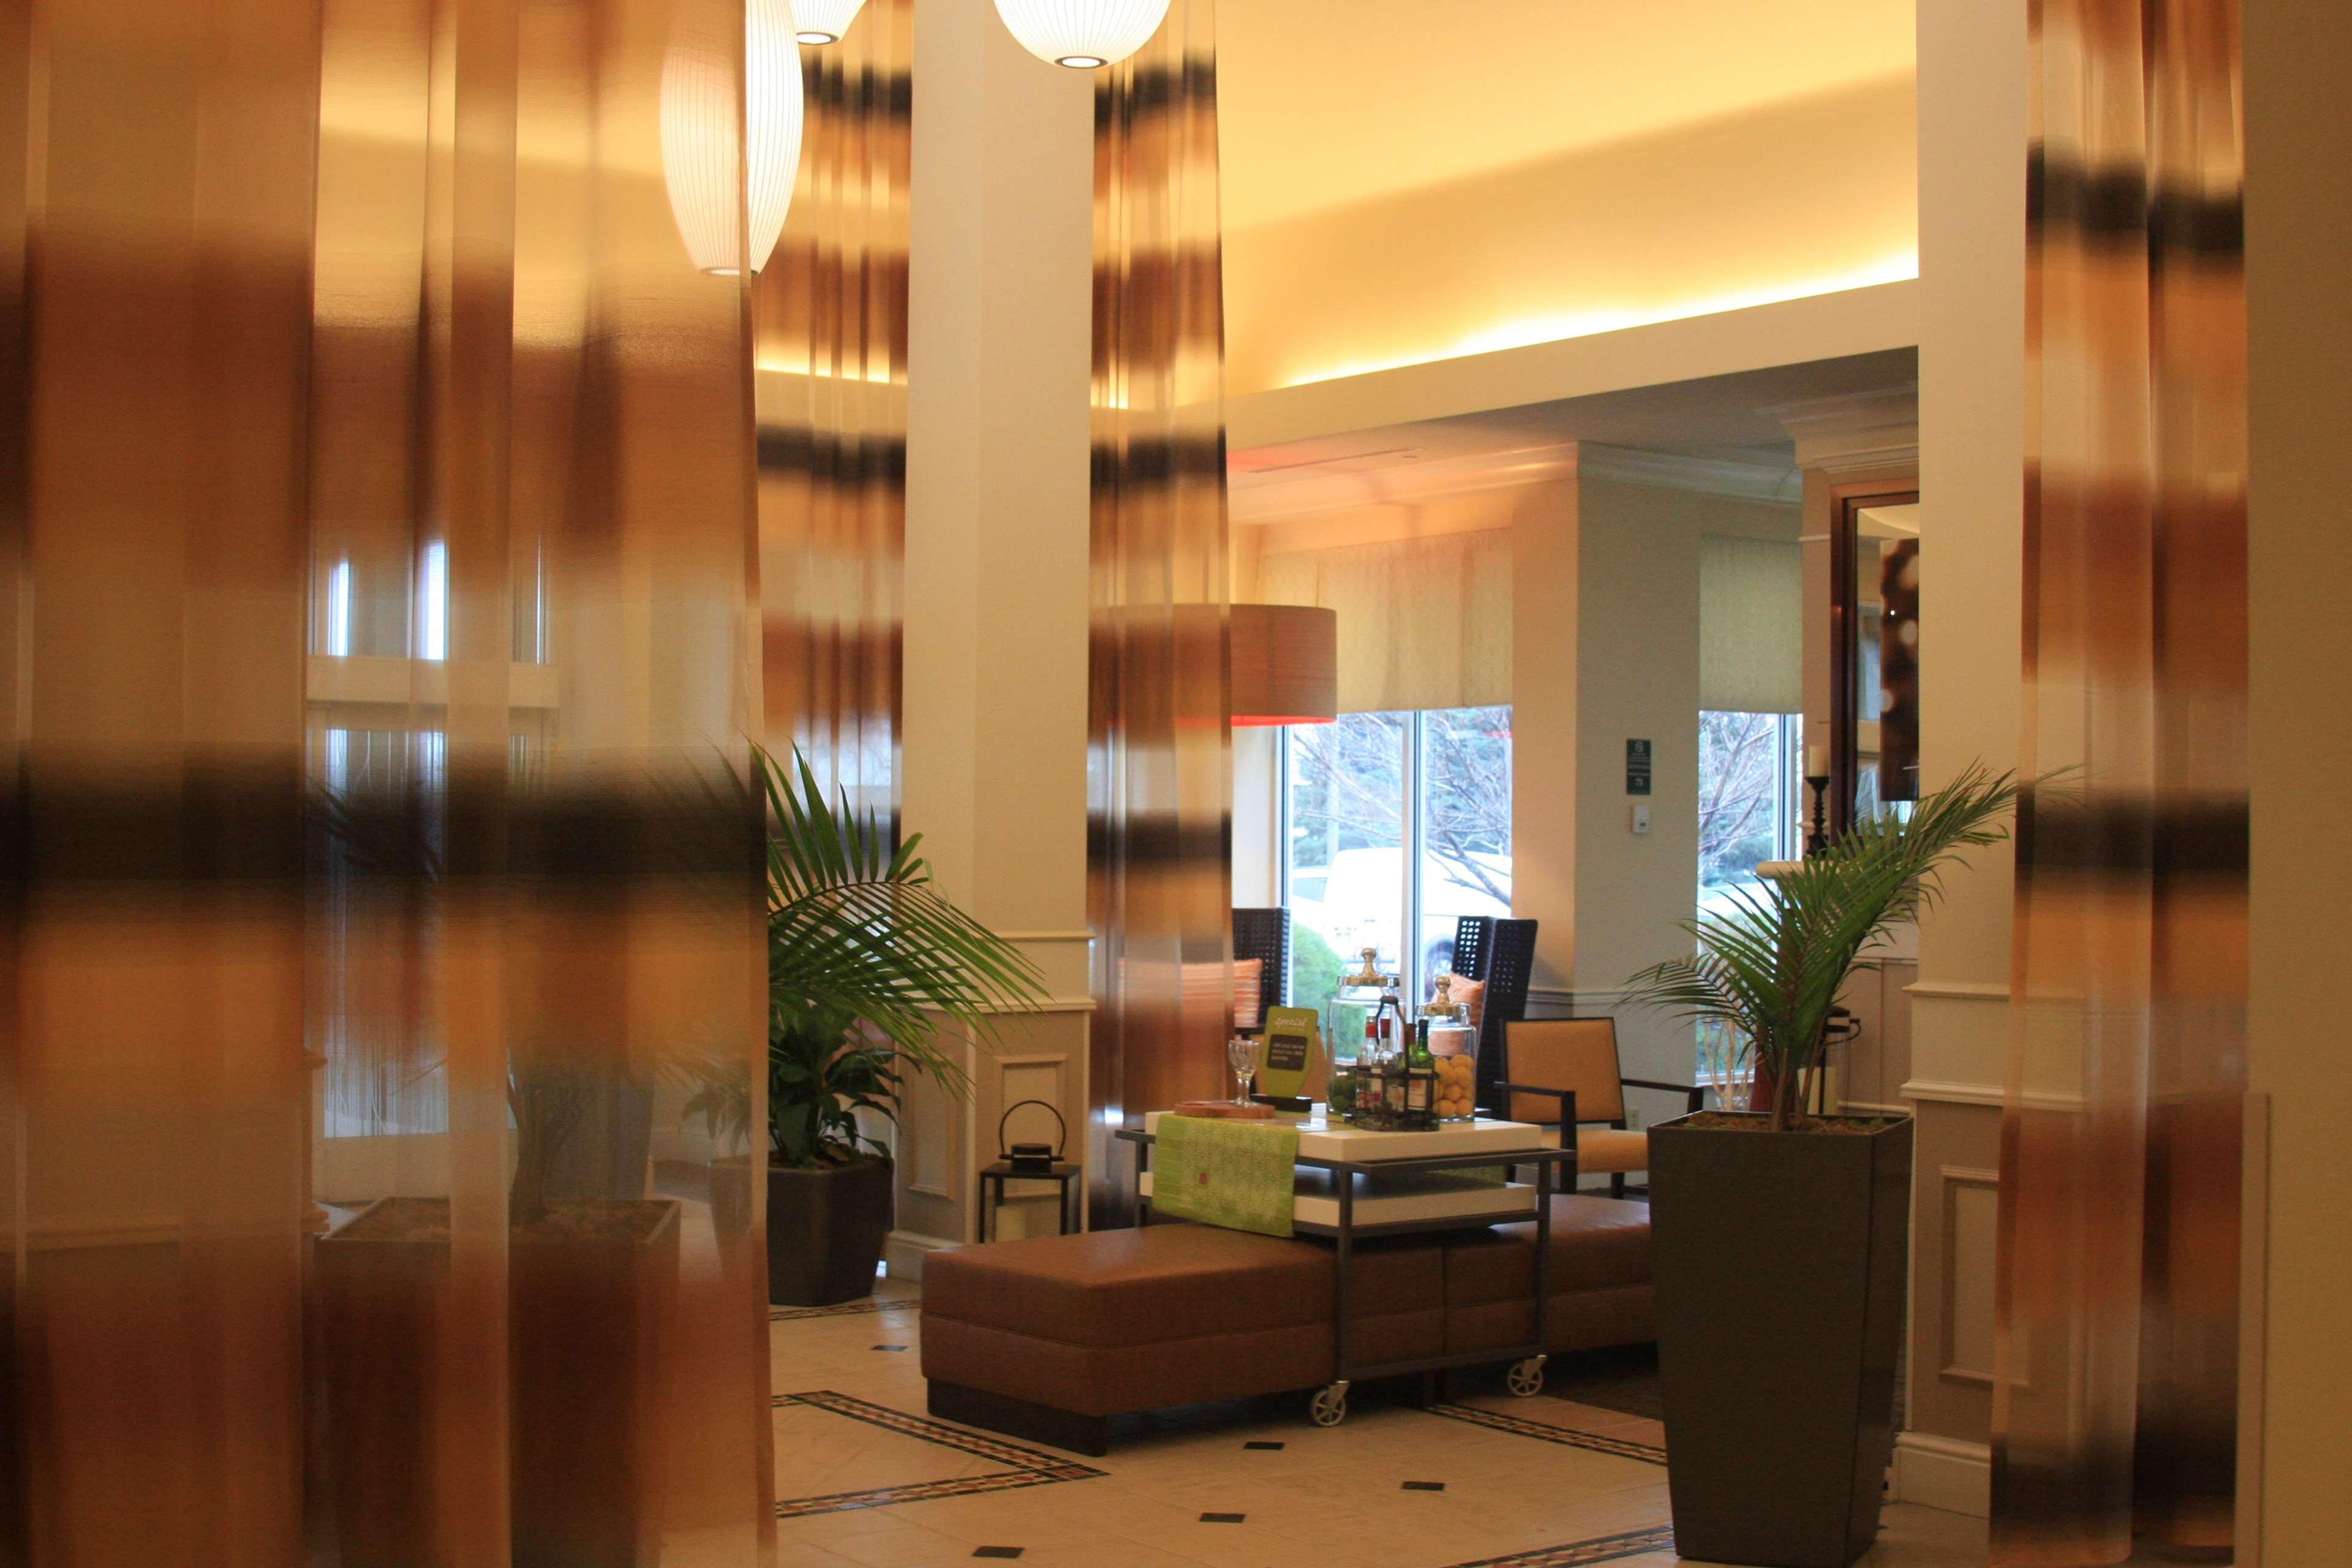 Hilton Garden Inn Elmira/Corning image 7